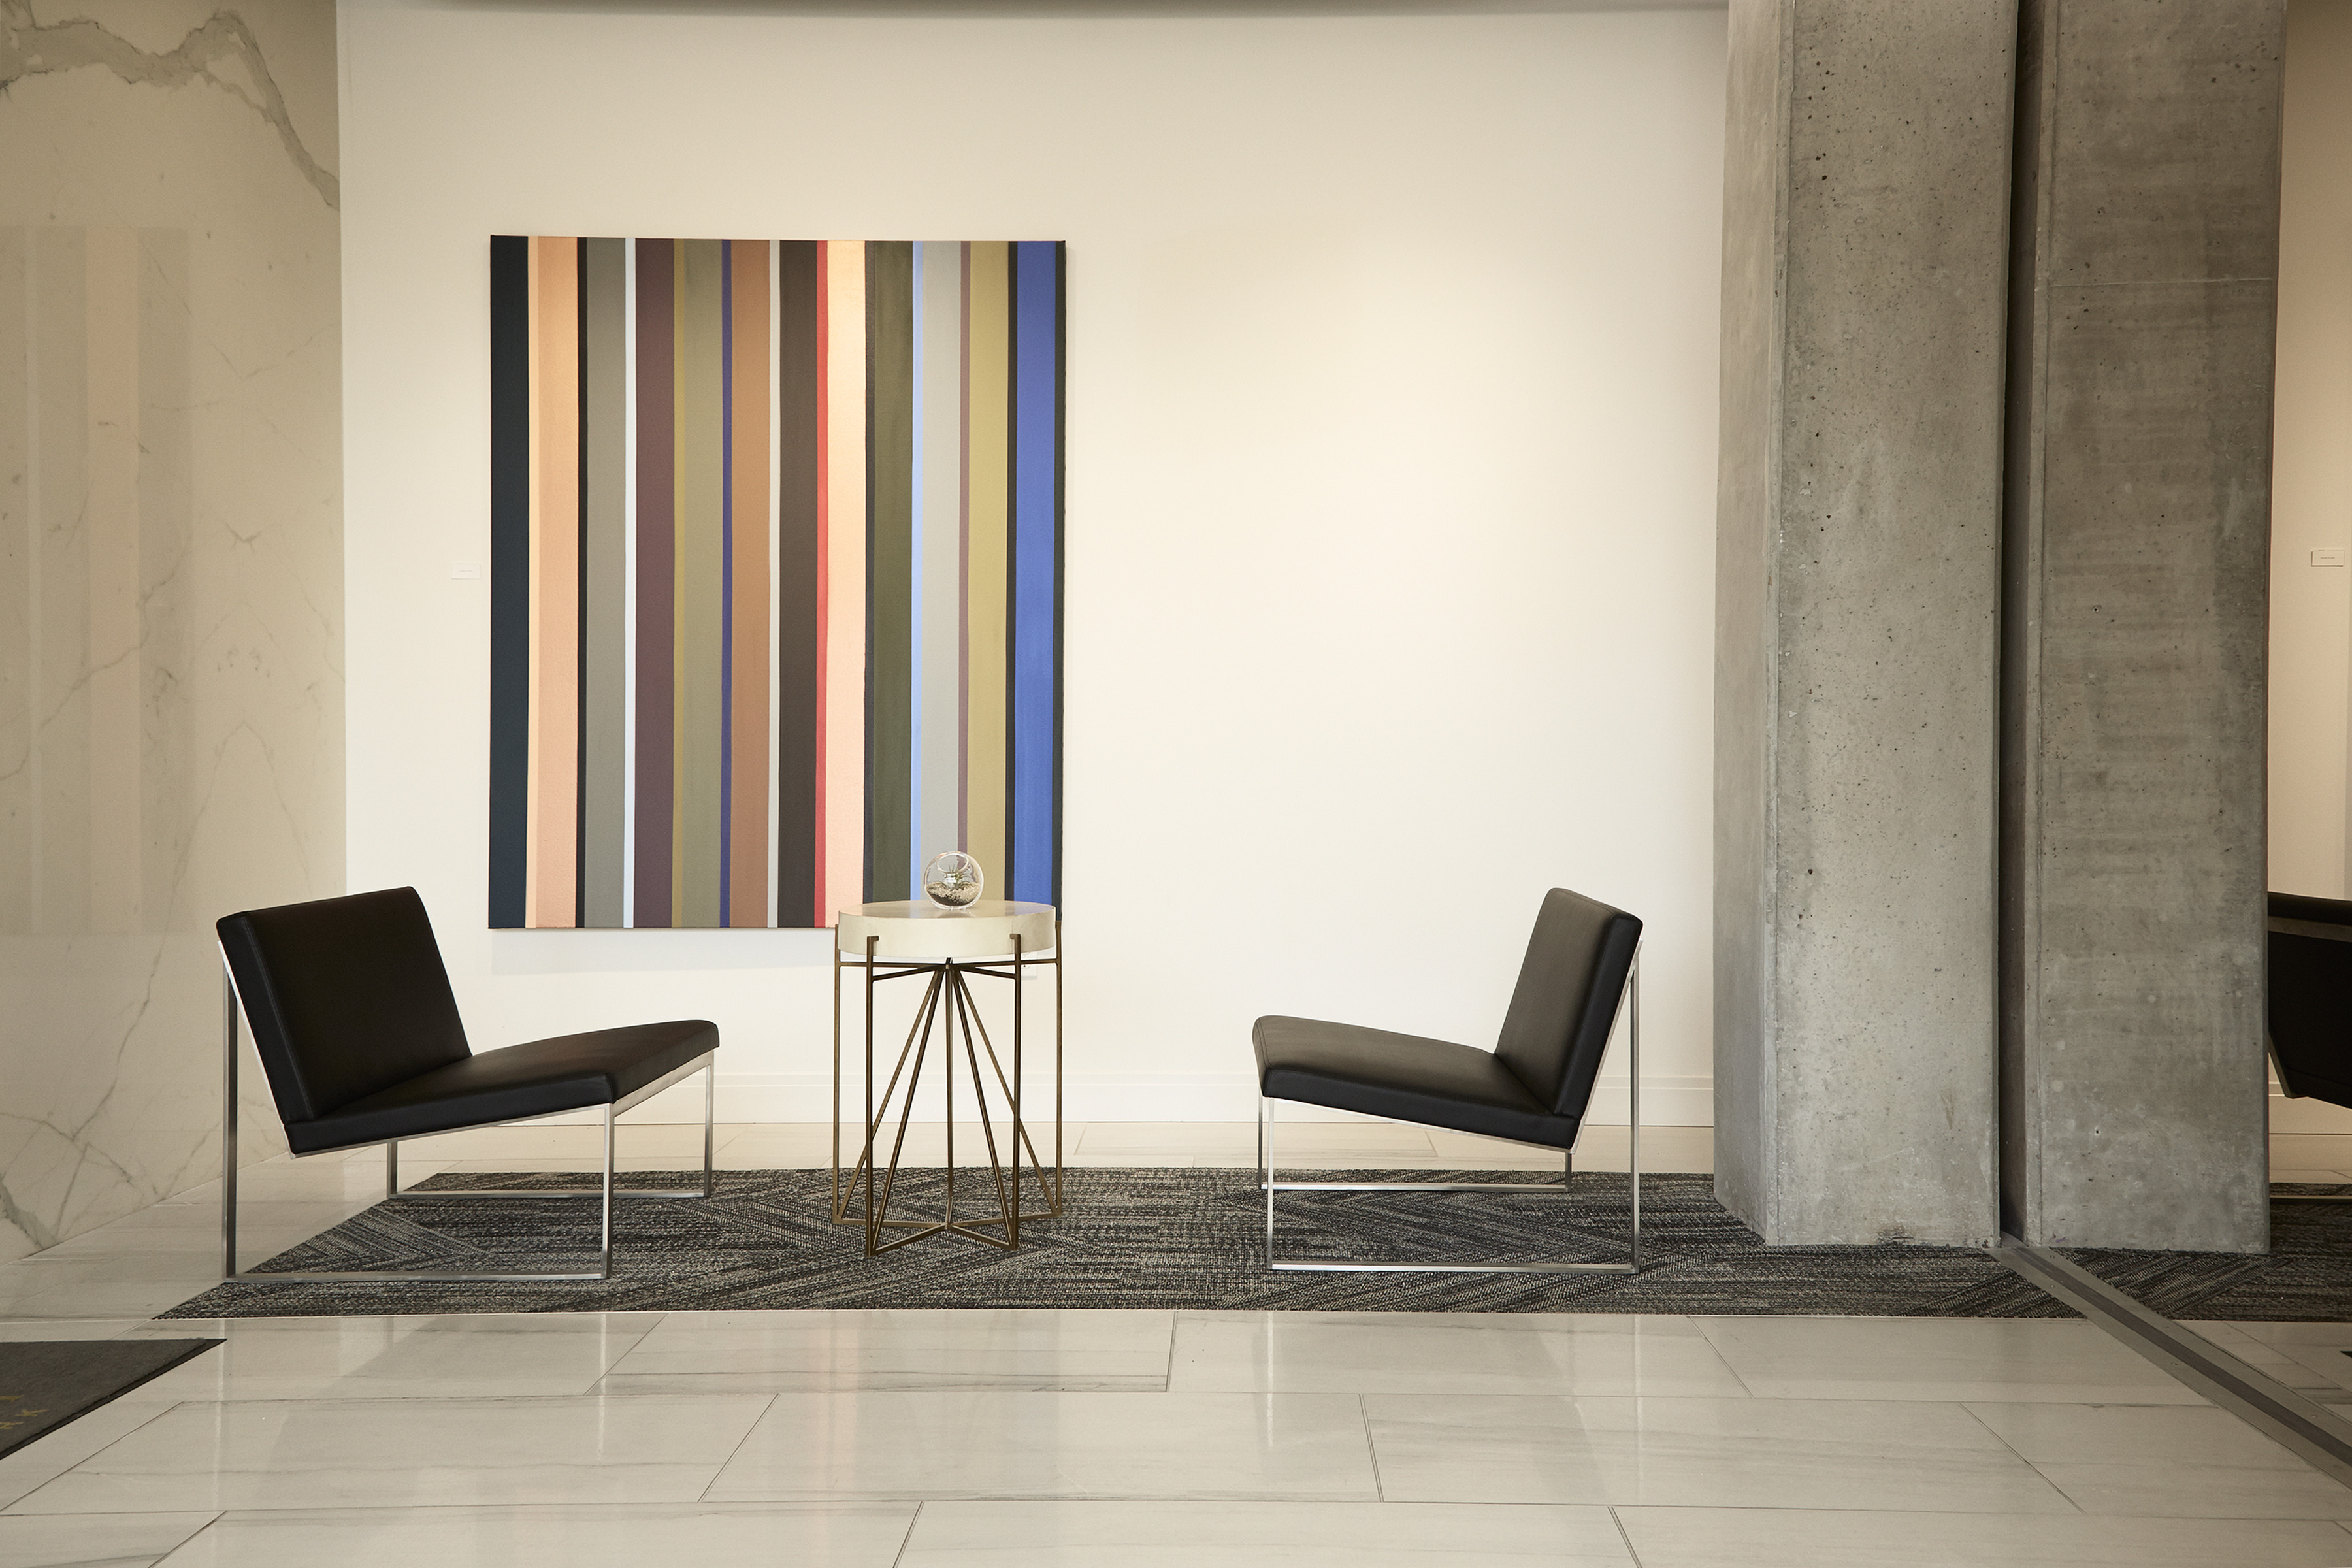 Lobby Art Gallery